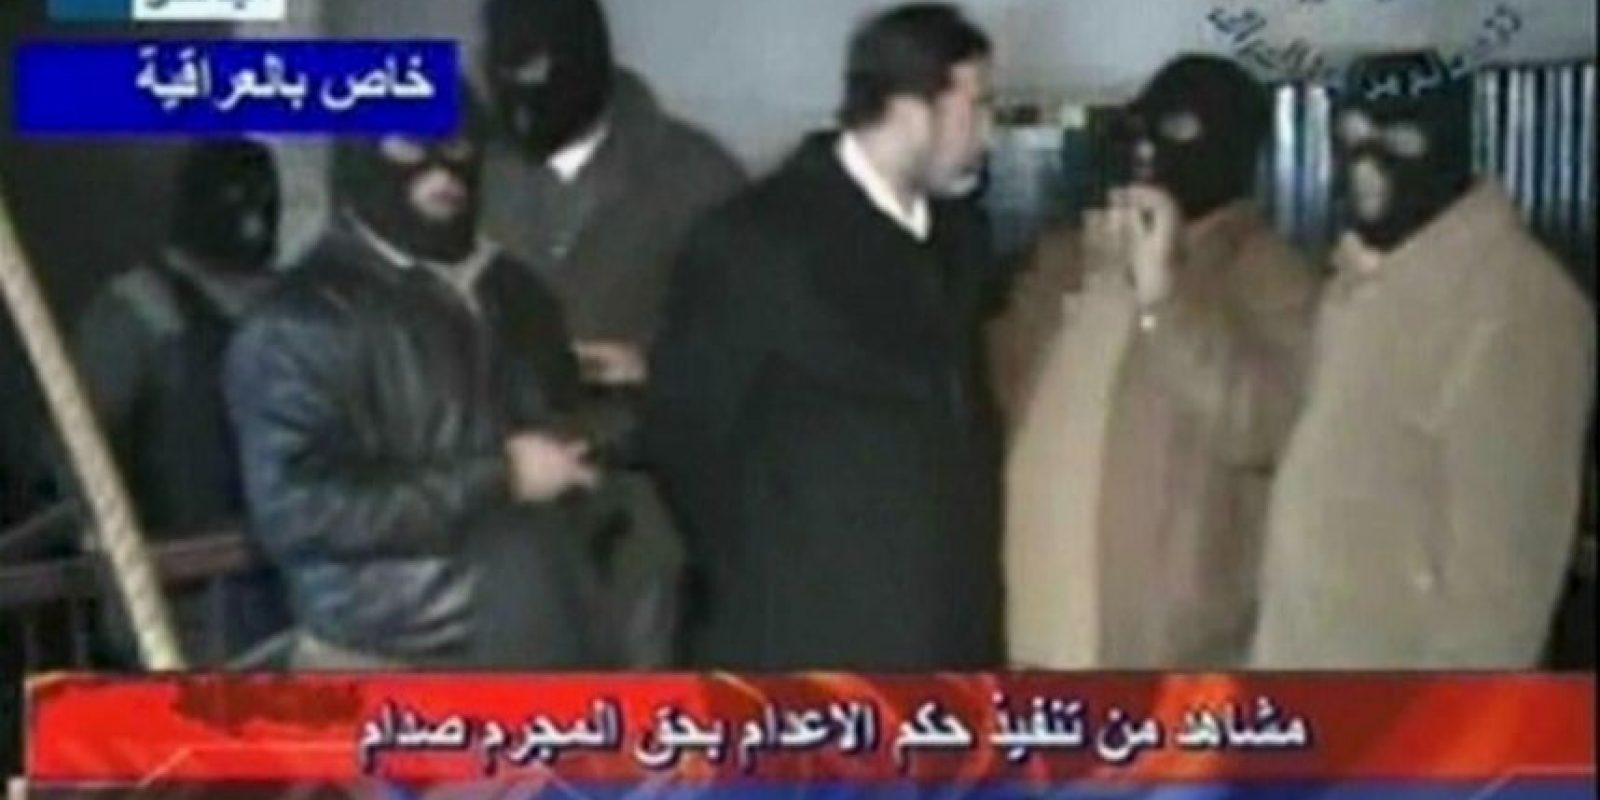 30 de diciembre de 2006: Hussein es ejecutado Foto:Getty Images